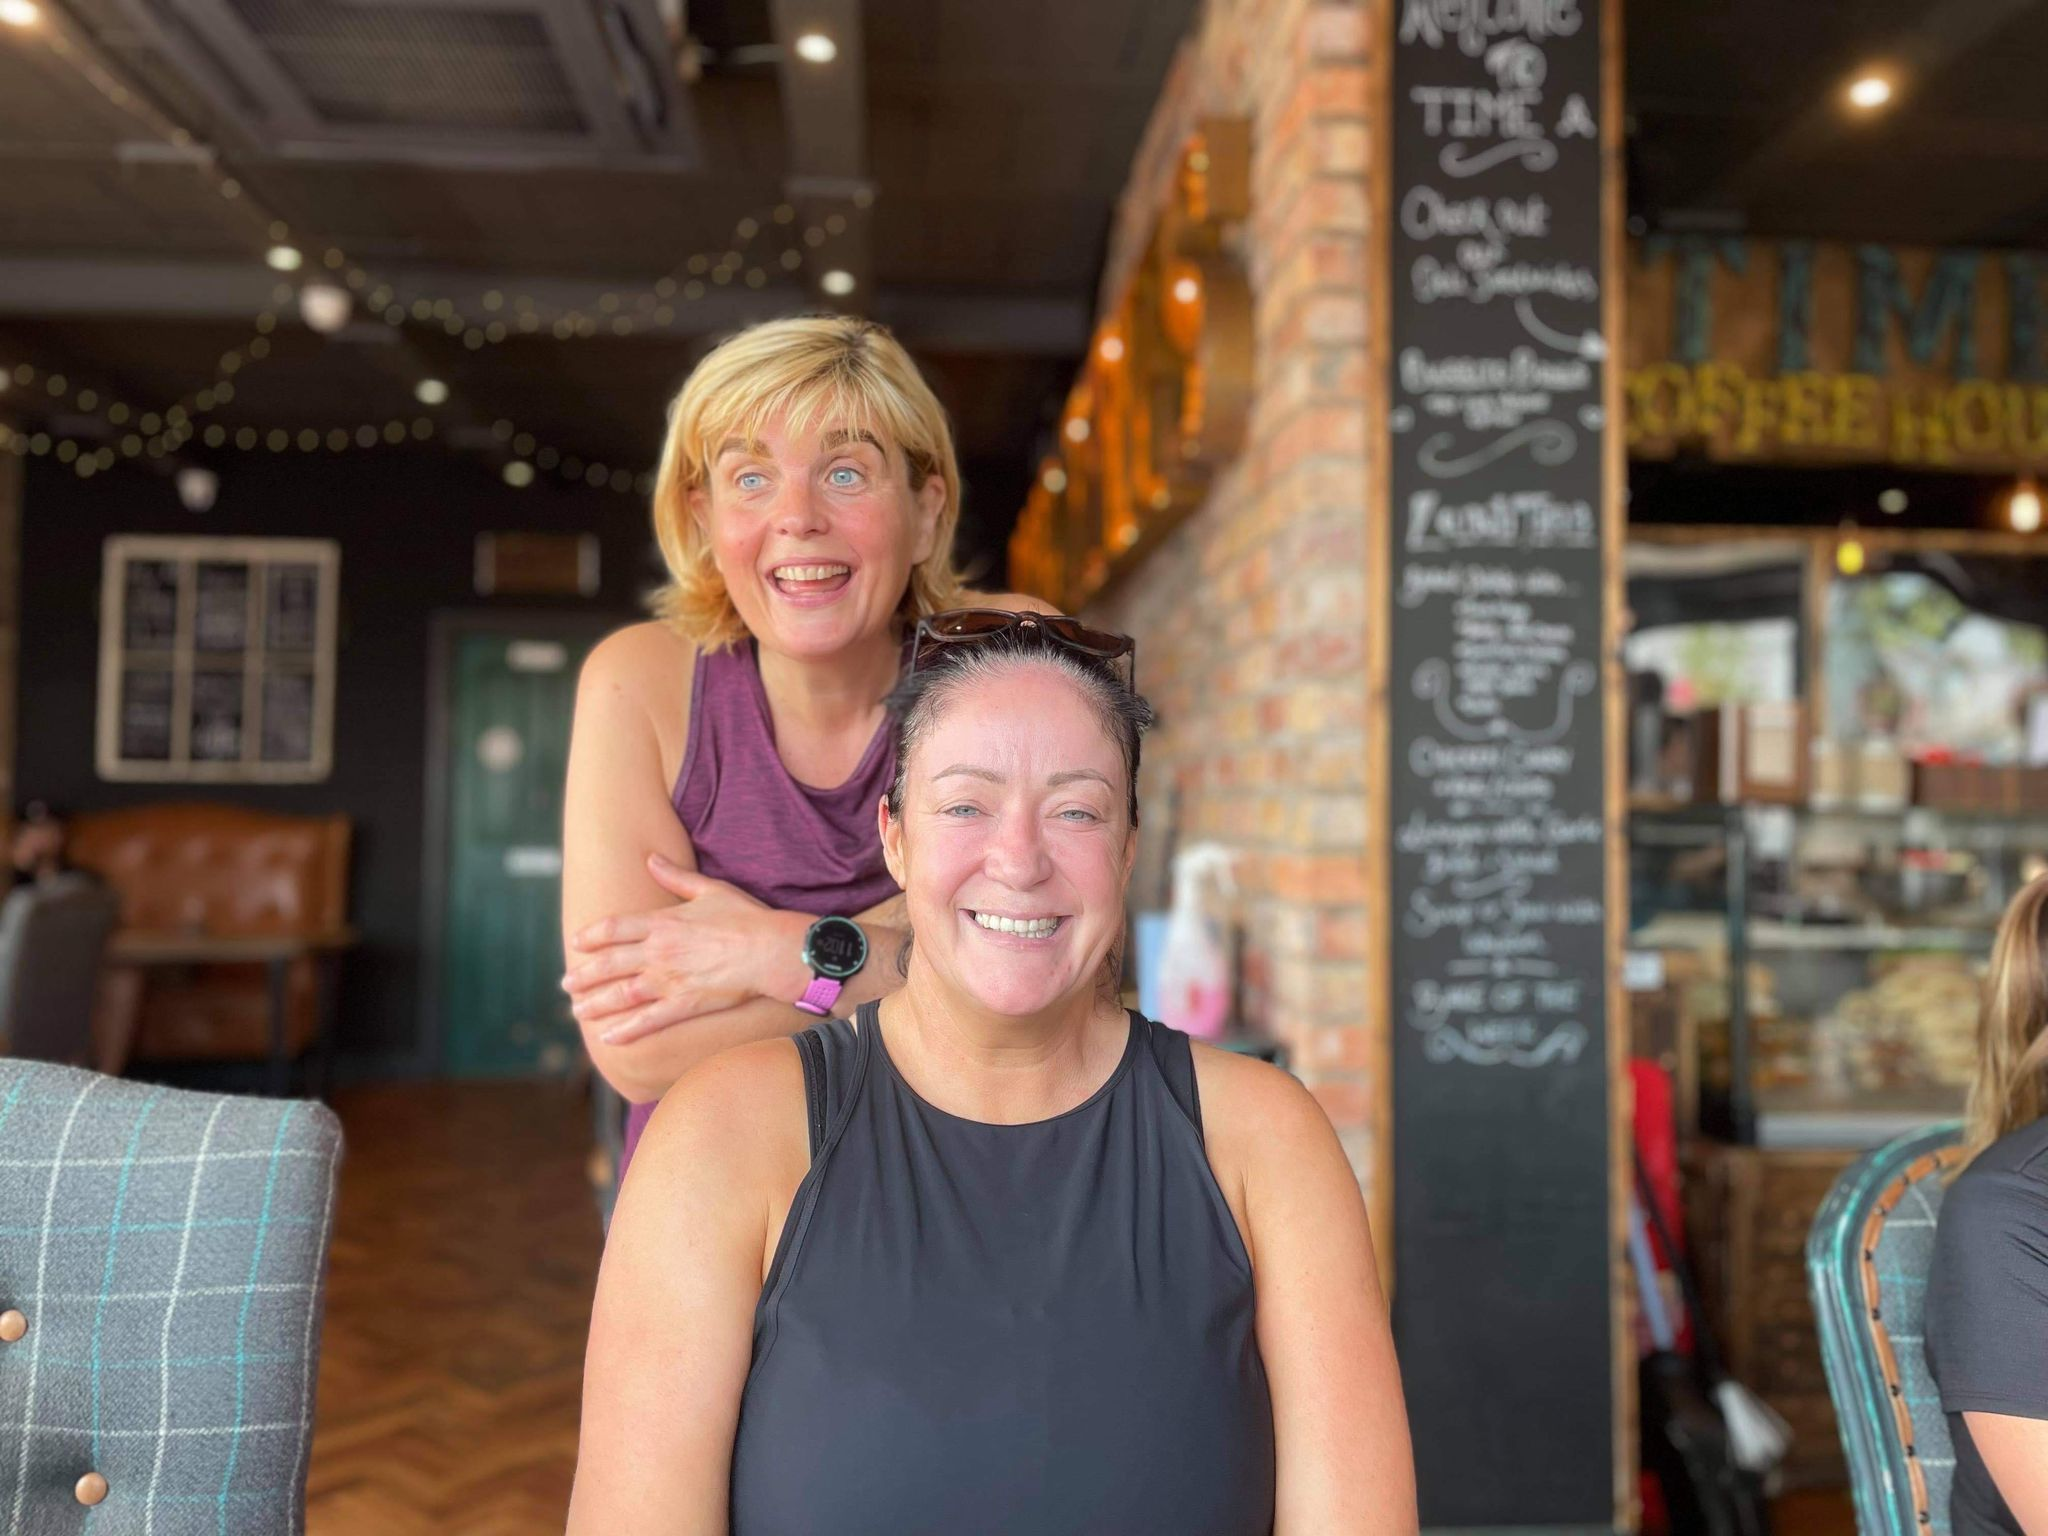 Susan 200 and Geraldine 100